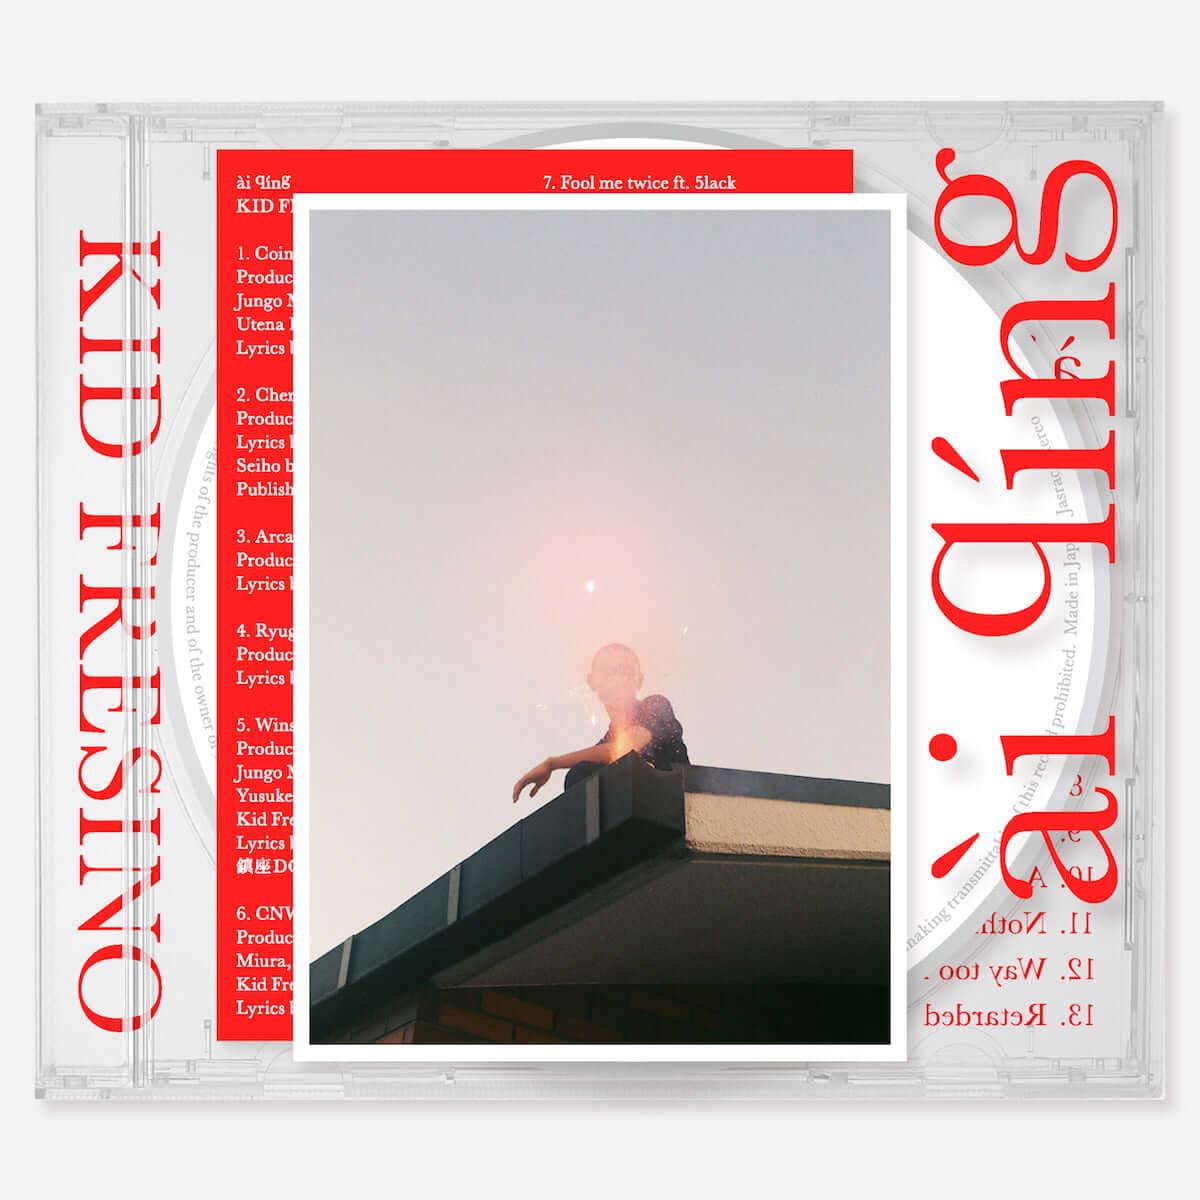 KID FRESINOによる3年振りとなる待望のフルアルバム「ài qíng」のジャケ写とトラックリストが公開 music181106-kidfresino-1-1200x1200